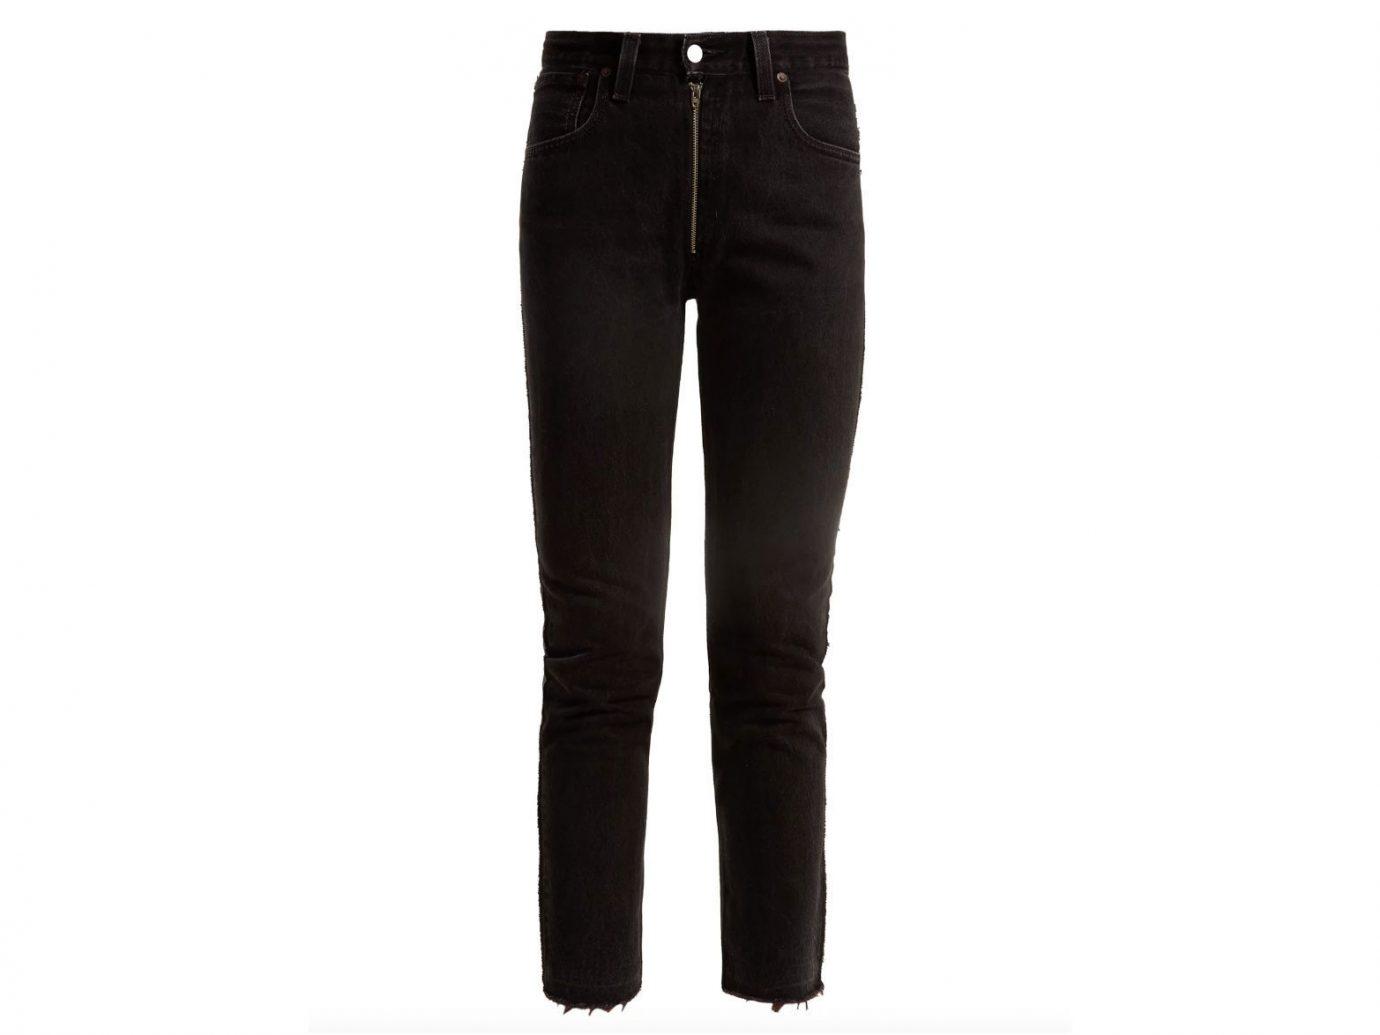 City NYC Style + Design Travel Shop clothing trouser suit jeans denim wearing trousers waist pocket active pants posing